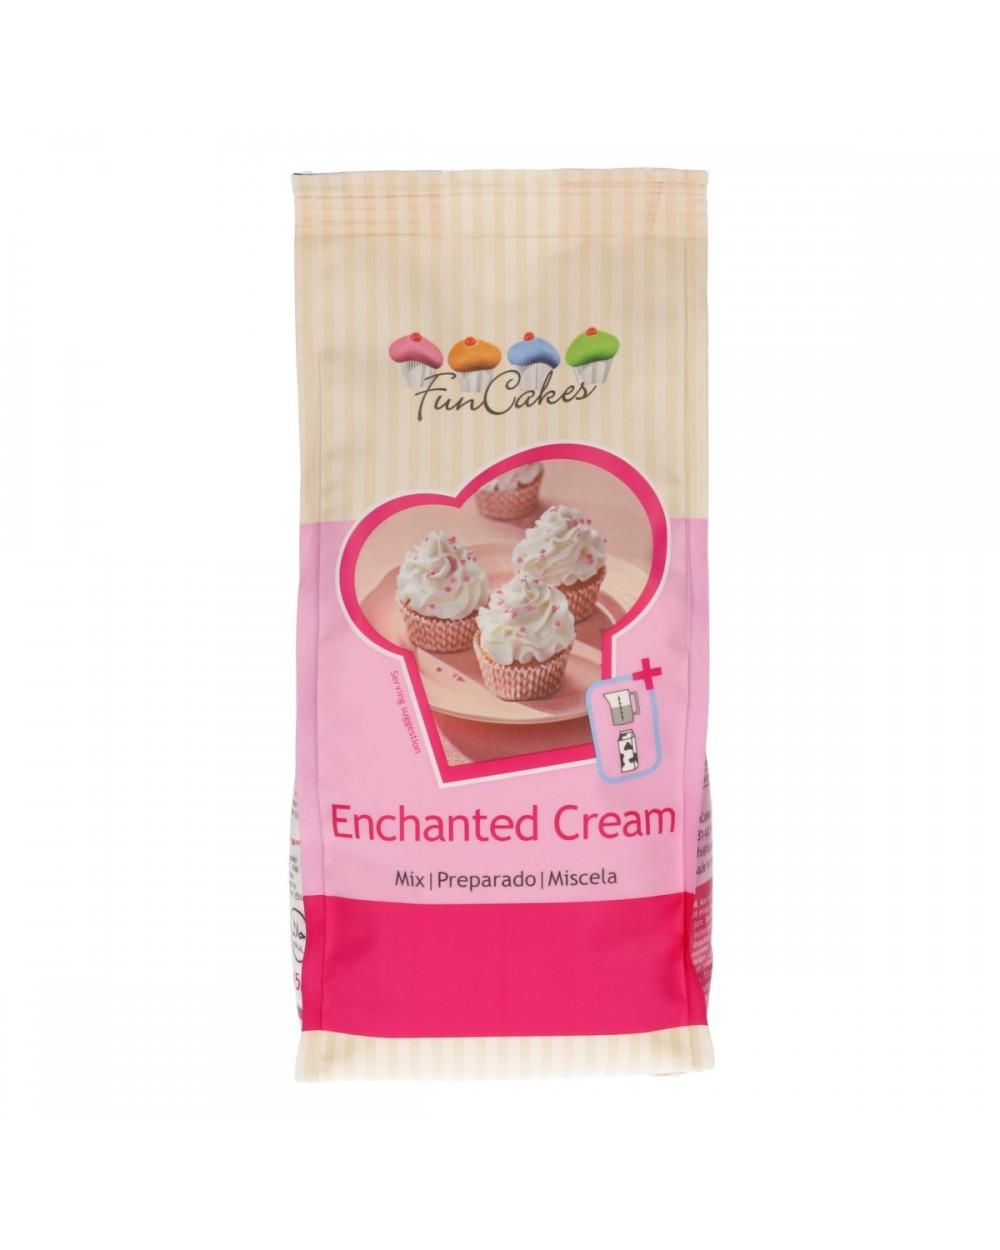 FunCakes Enchanted Cream 450g+